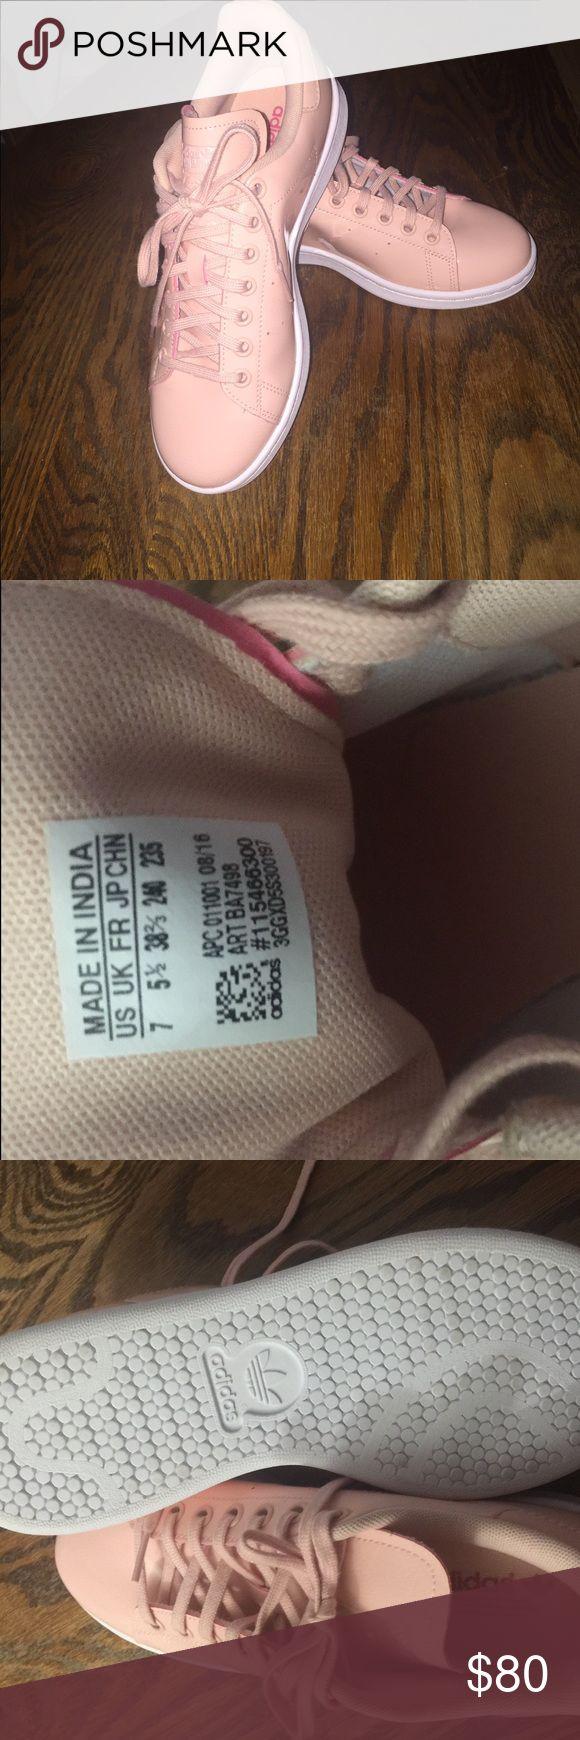 ✨Patent Women's Pink Shoes (Adidas originals)✨